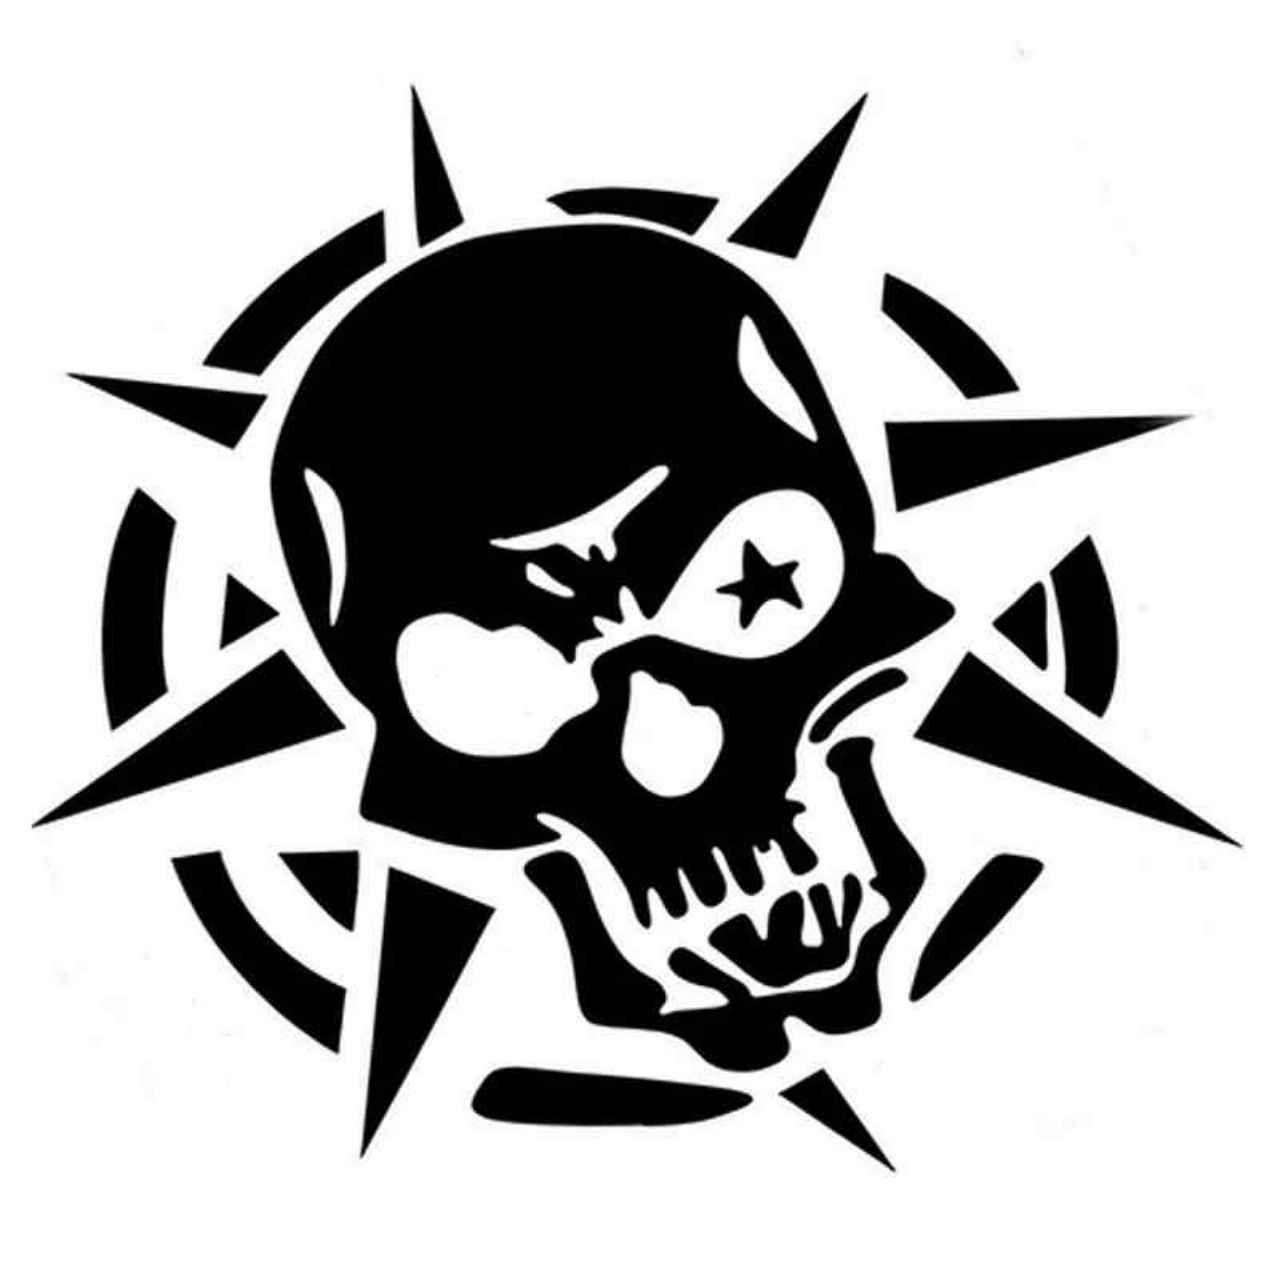 Skull Pv384 Vinyl Decal Sticker BallzBeatz . com Skull